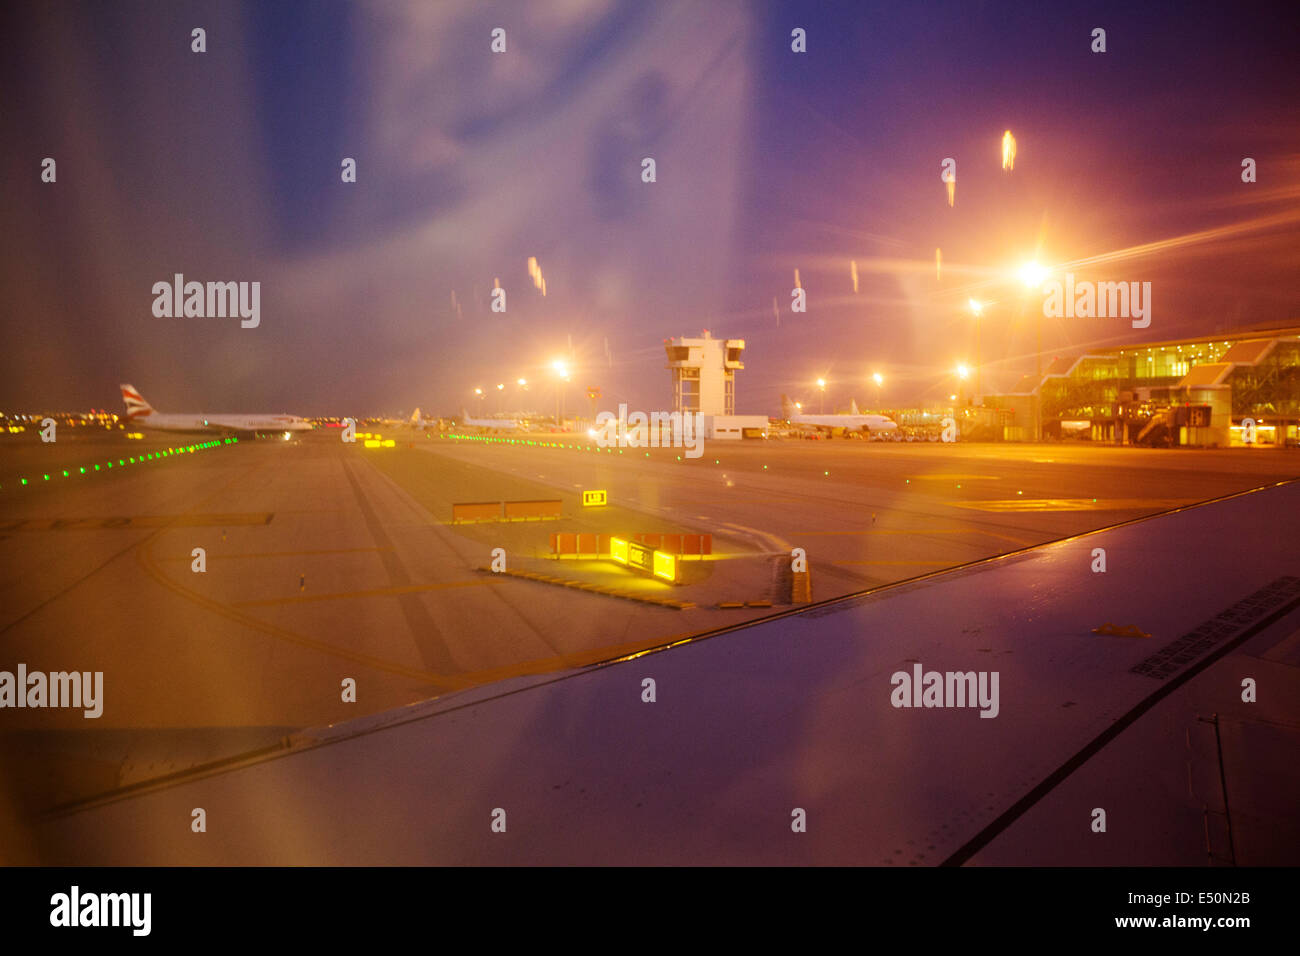 Barcelona El Prat Airport Cataluña Spain España aeropuerto - Stock Image